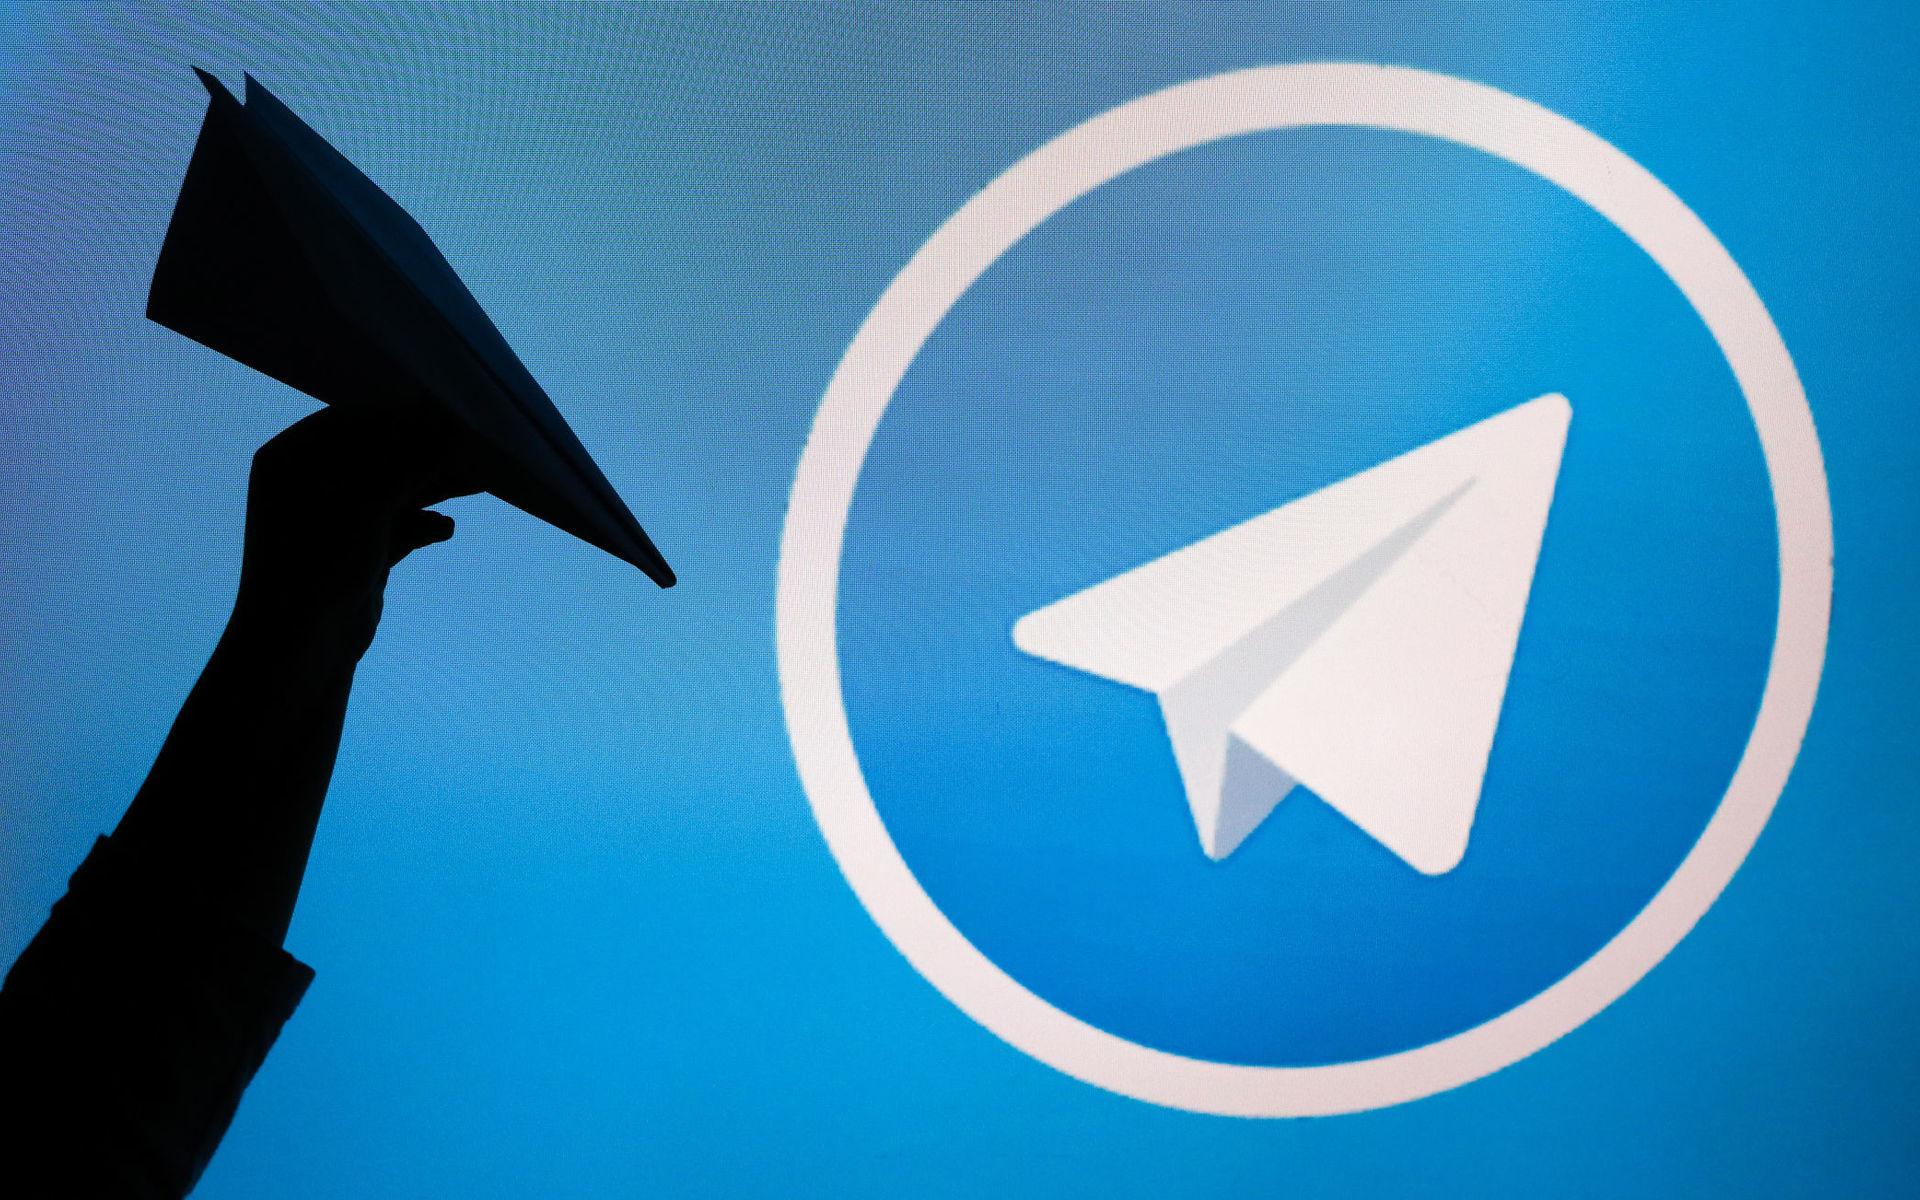 Telegram запустит блокчейн-платформу совместно с немецким сервисом Wirecard AG